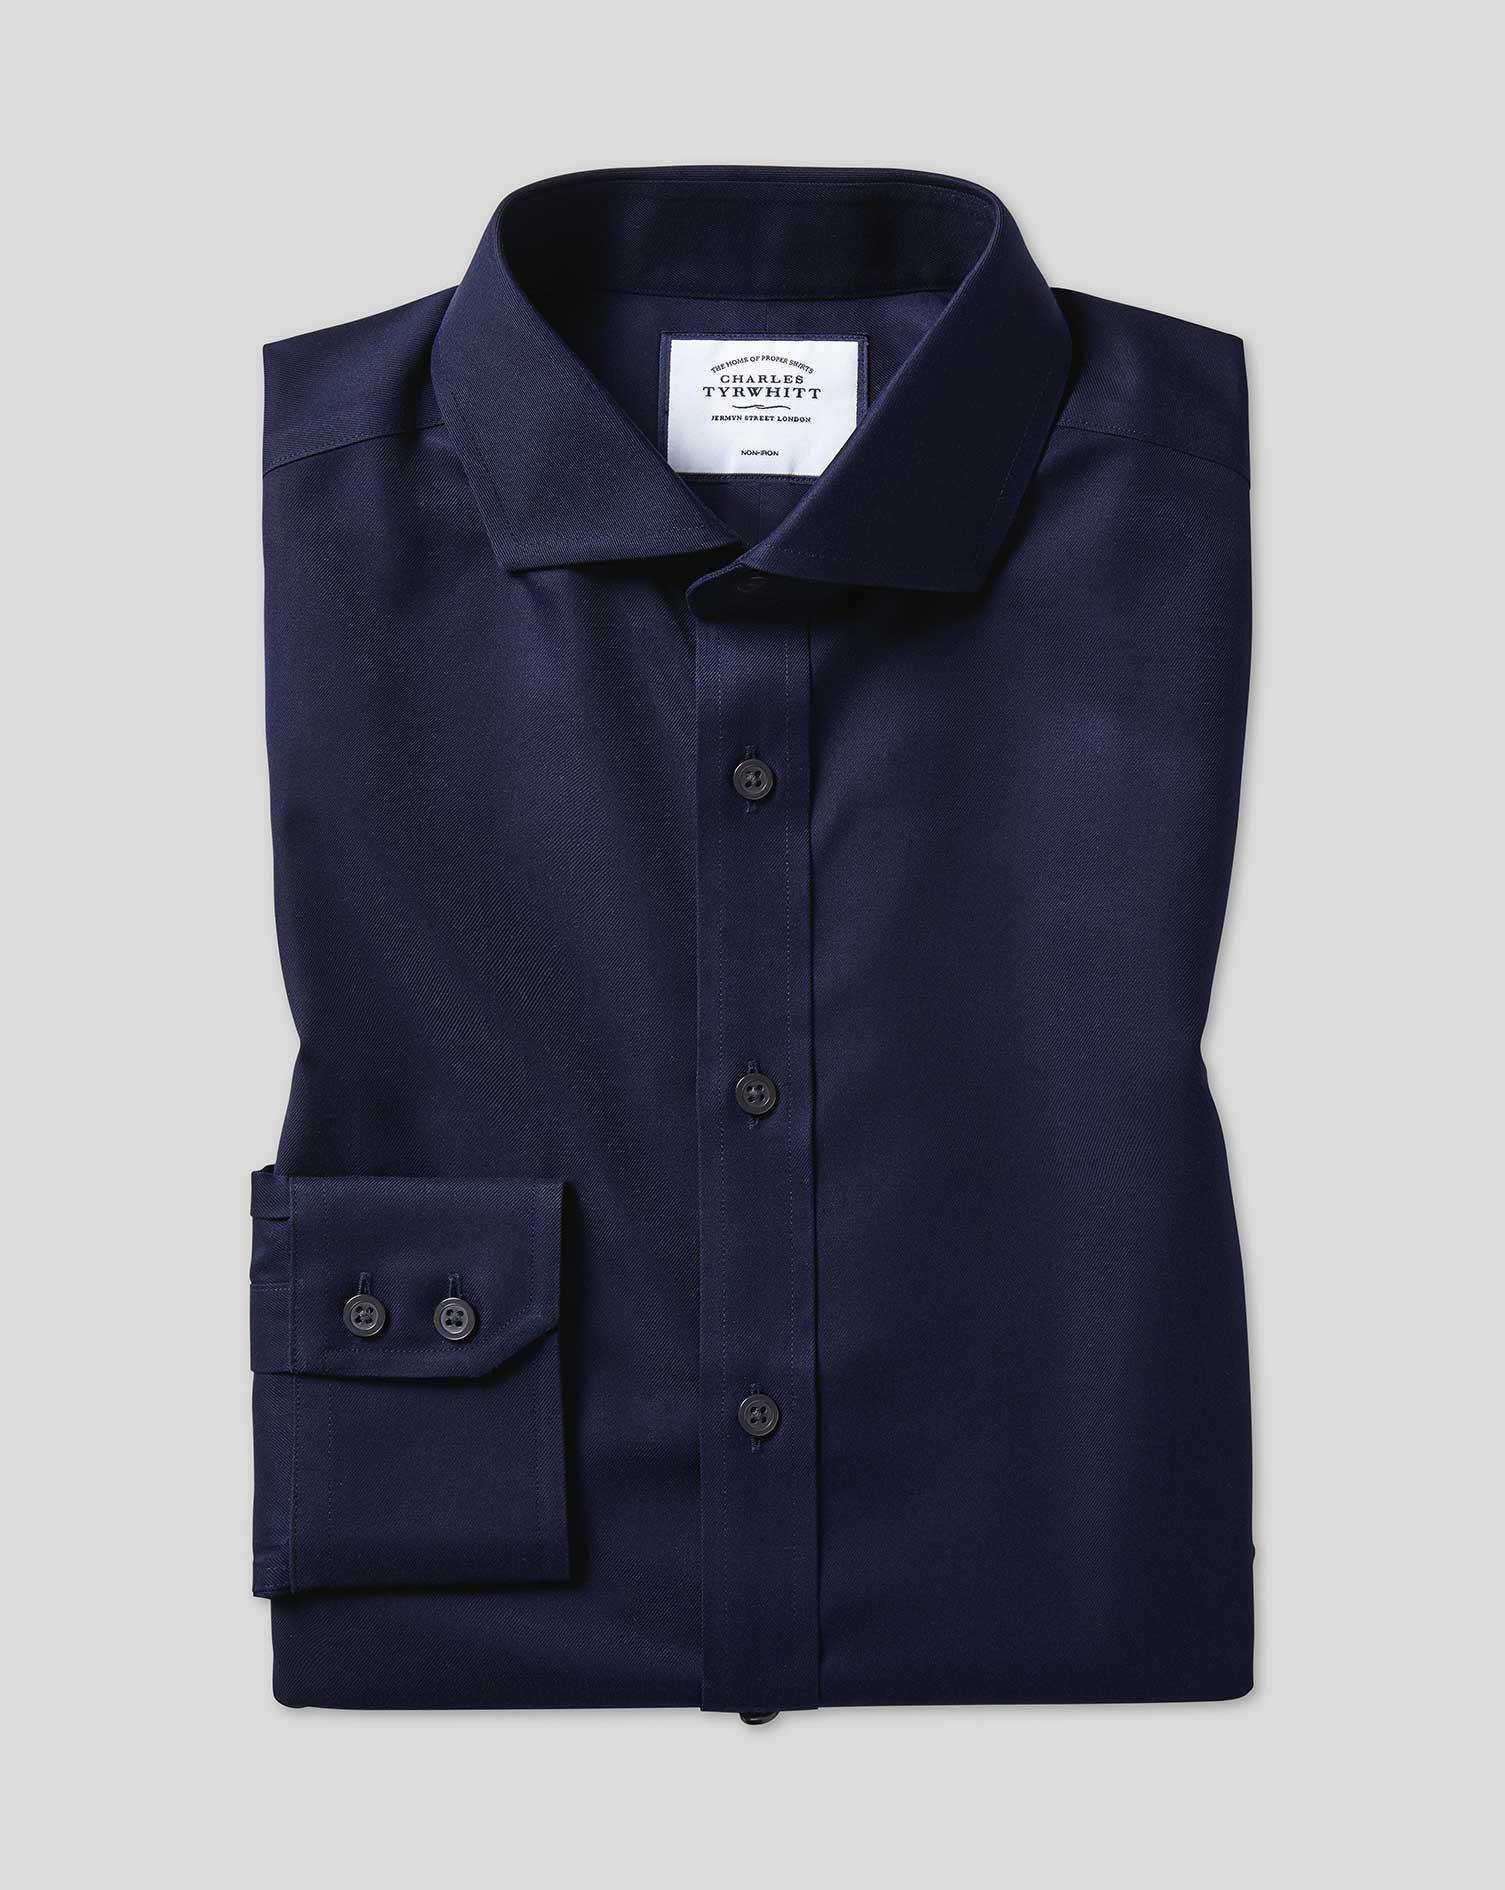 Cotton Extra Slim Fit Navy Non-Iron Cutaway Twill Shirt